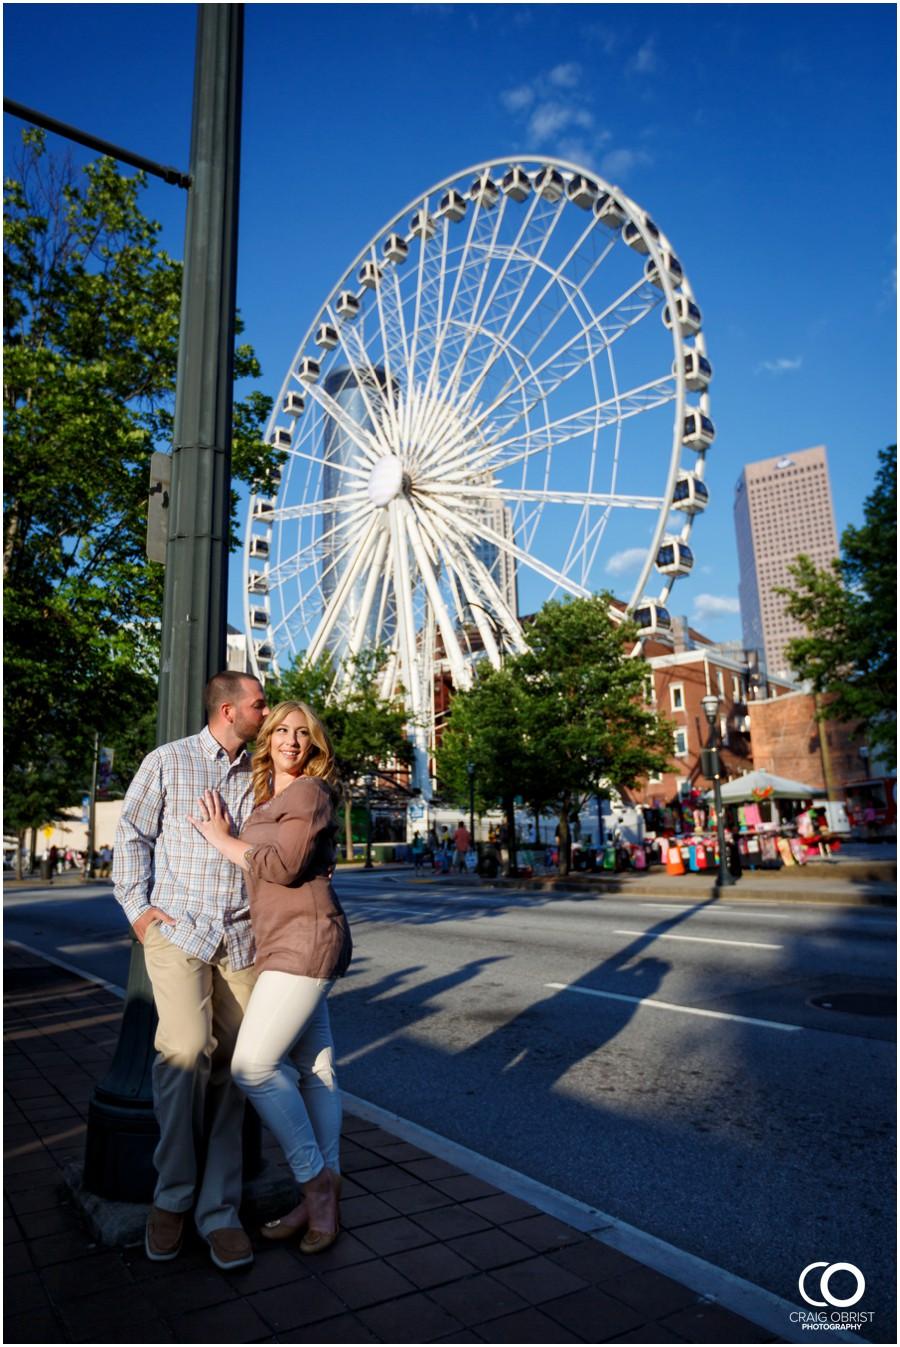 Philips-Arena-Atlanta-Buckhead-City-Engagement-Portraits_0006.jpg